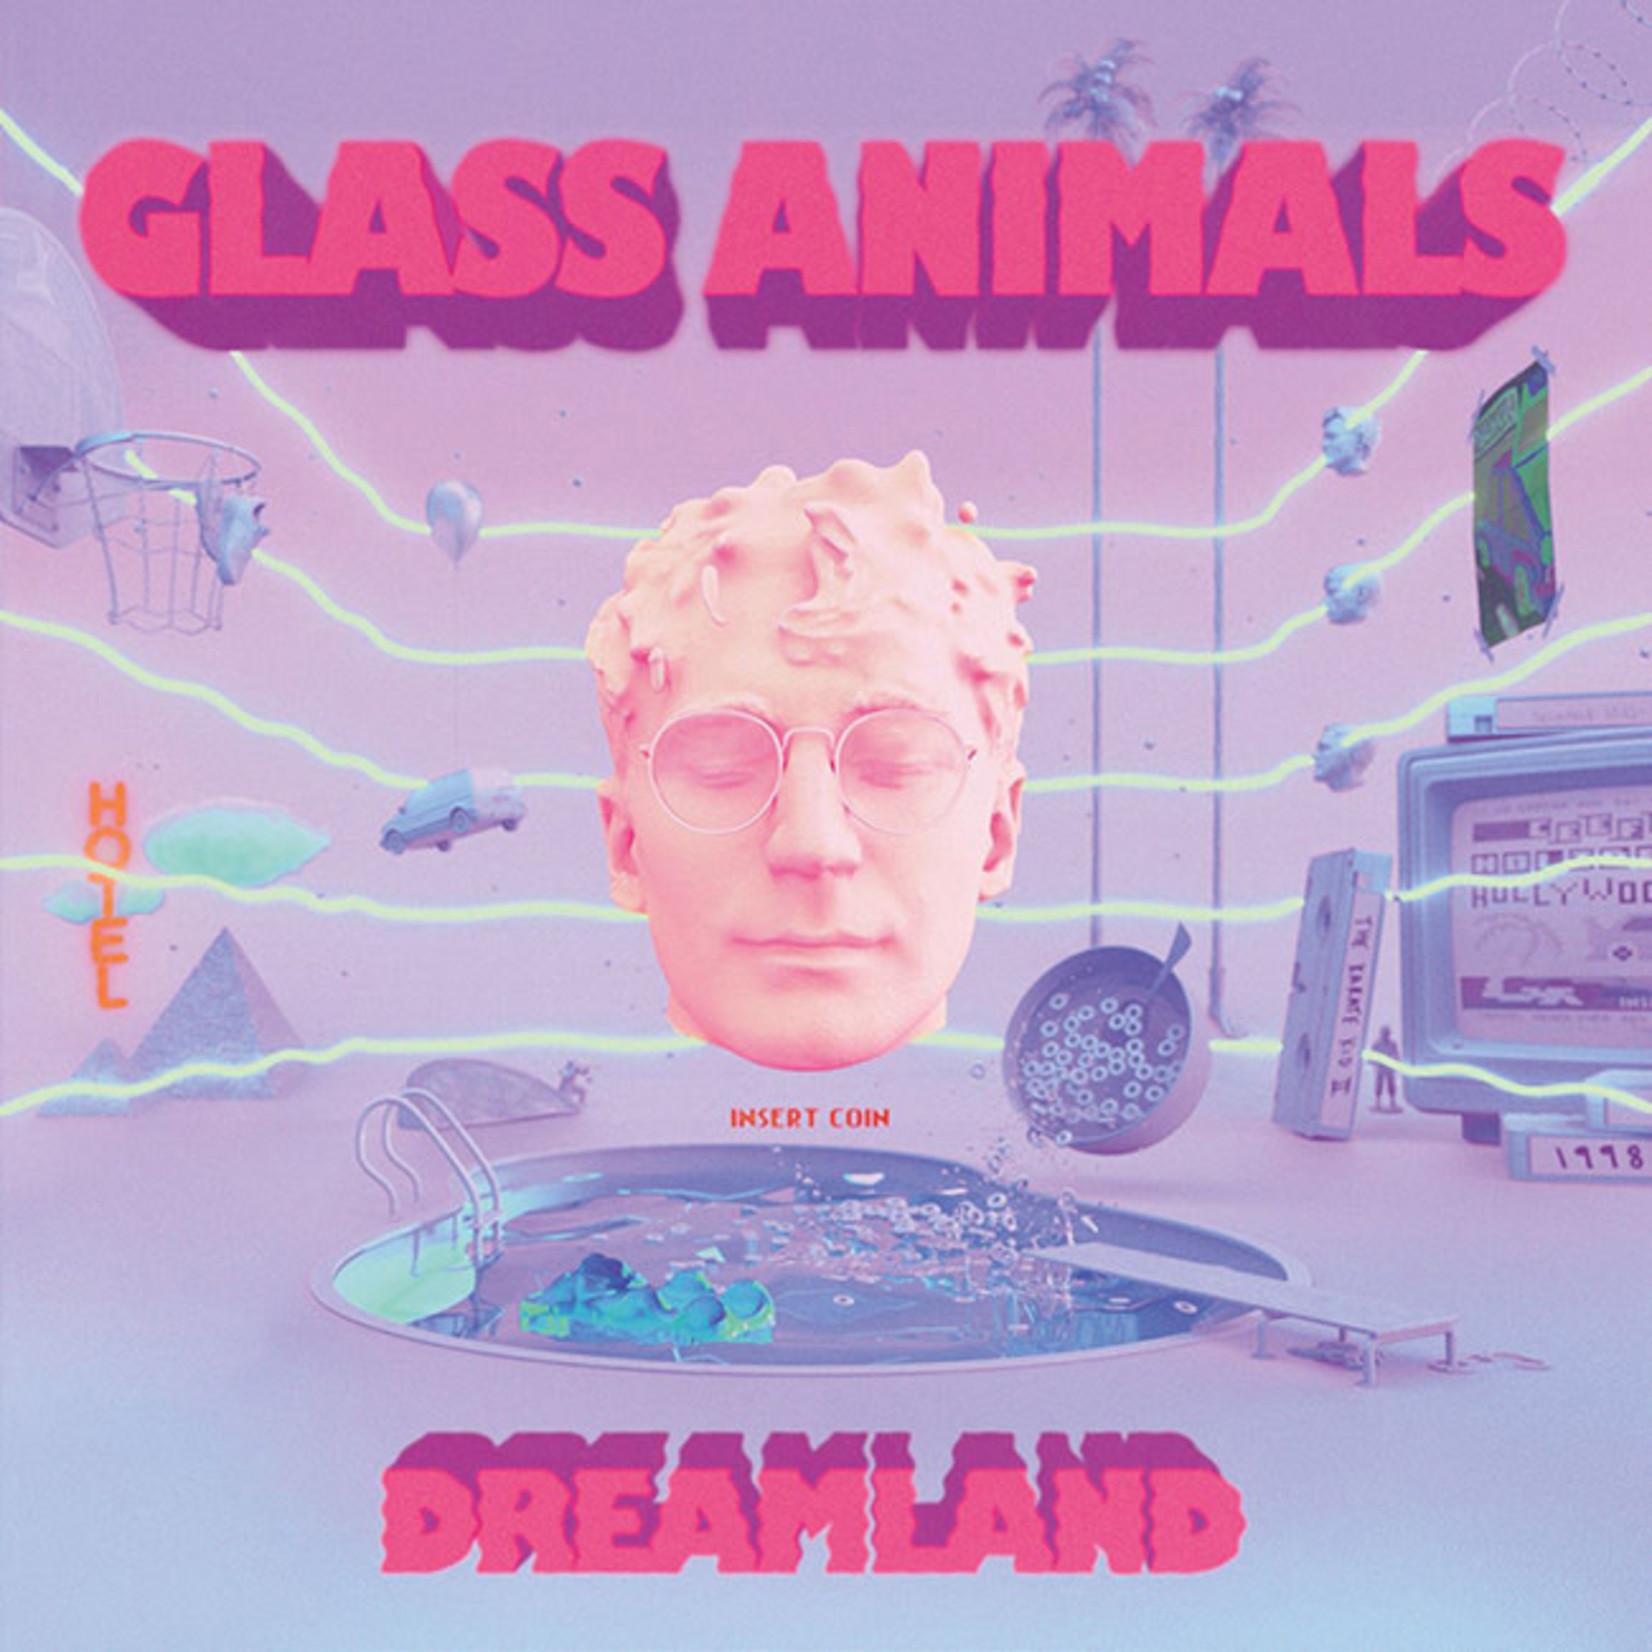 [New] Glass Animals: Dreamland